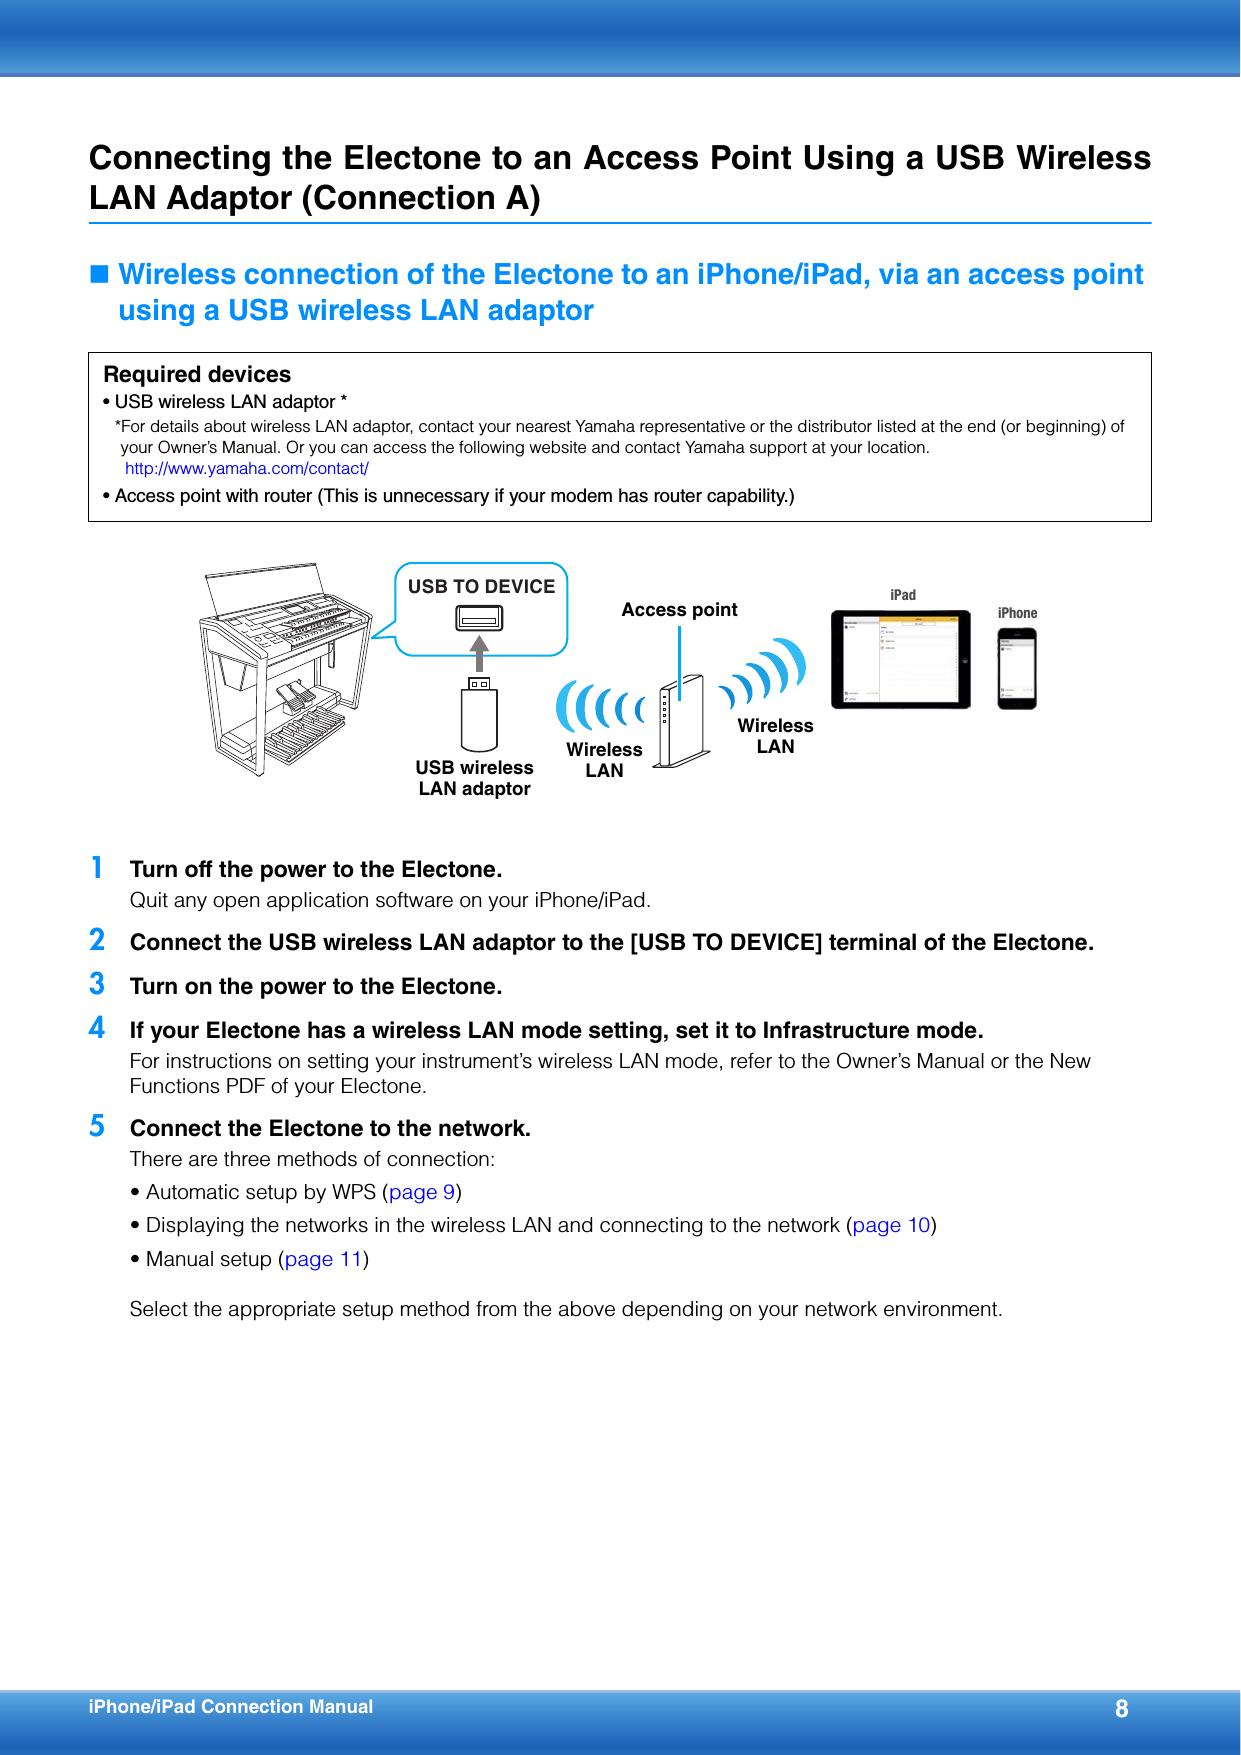 Yamaha For Electone Users IPhone/iPad Connection Manua I